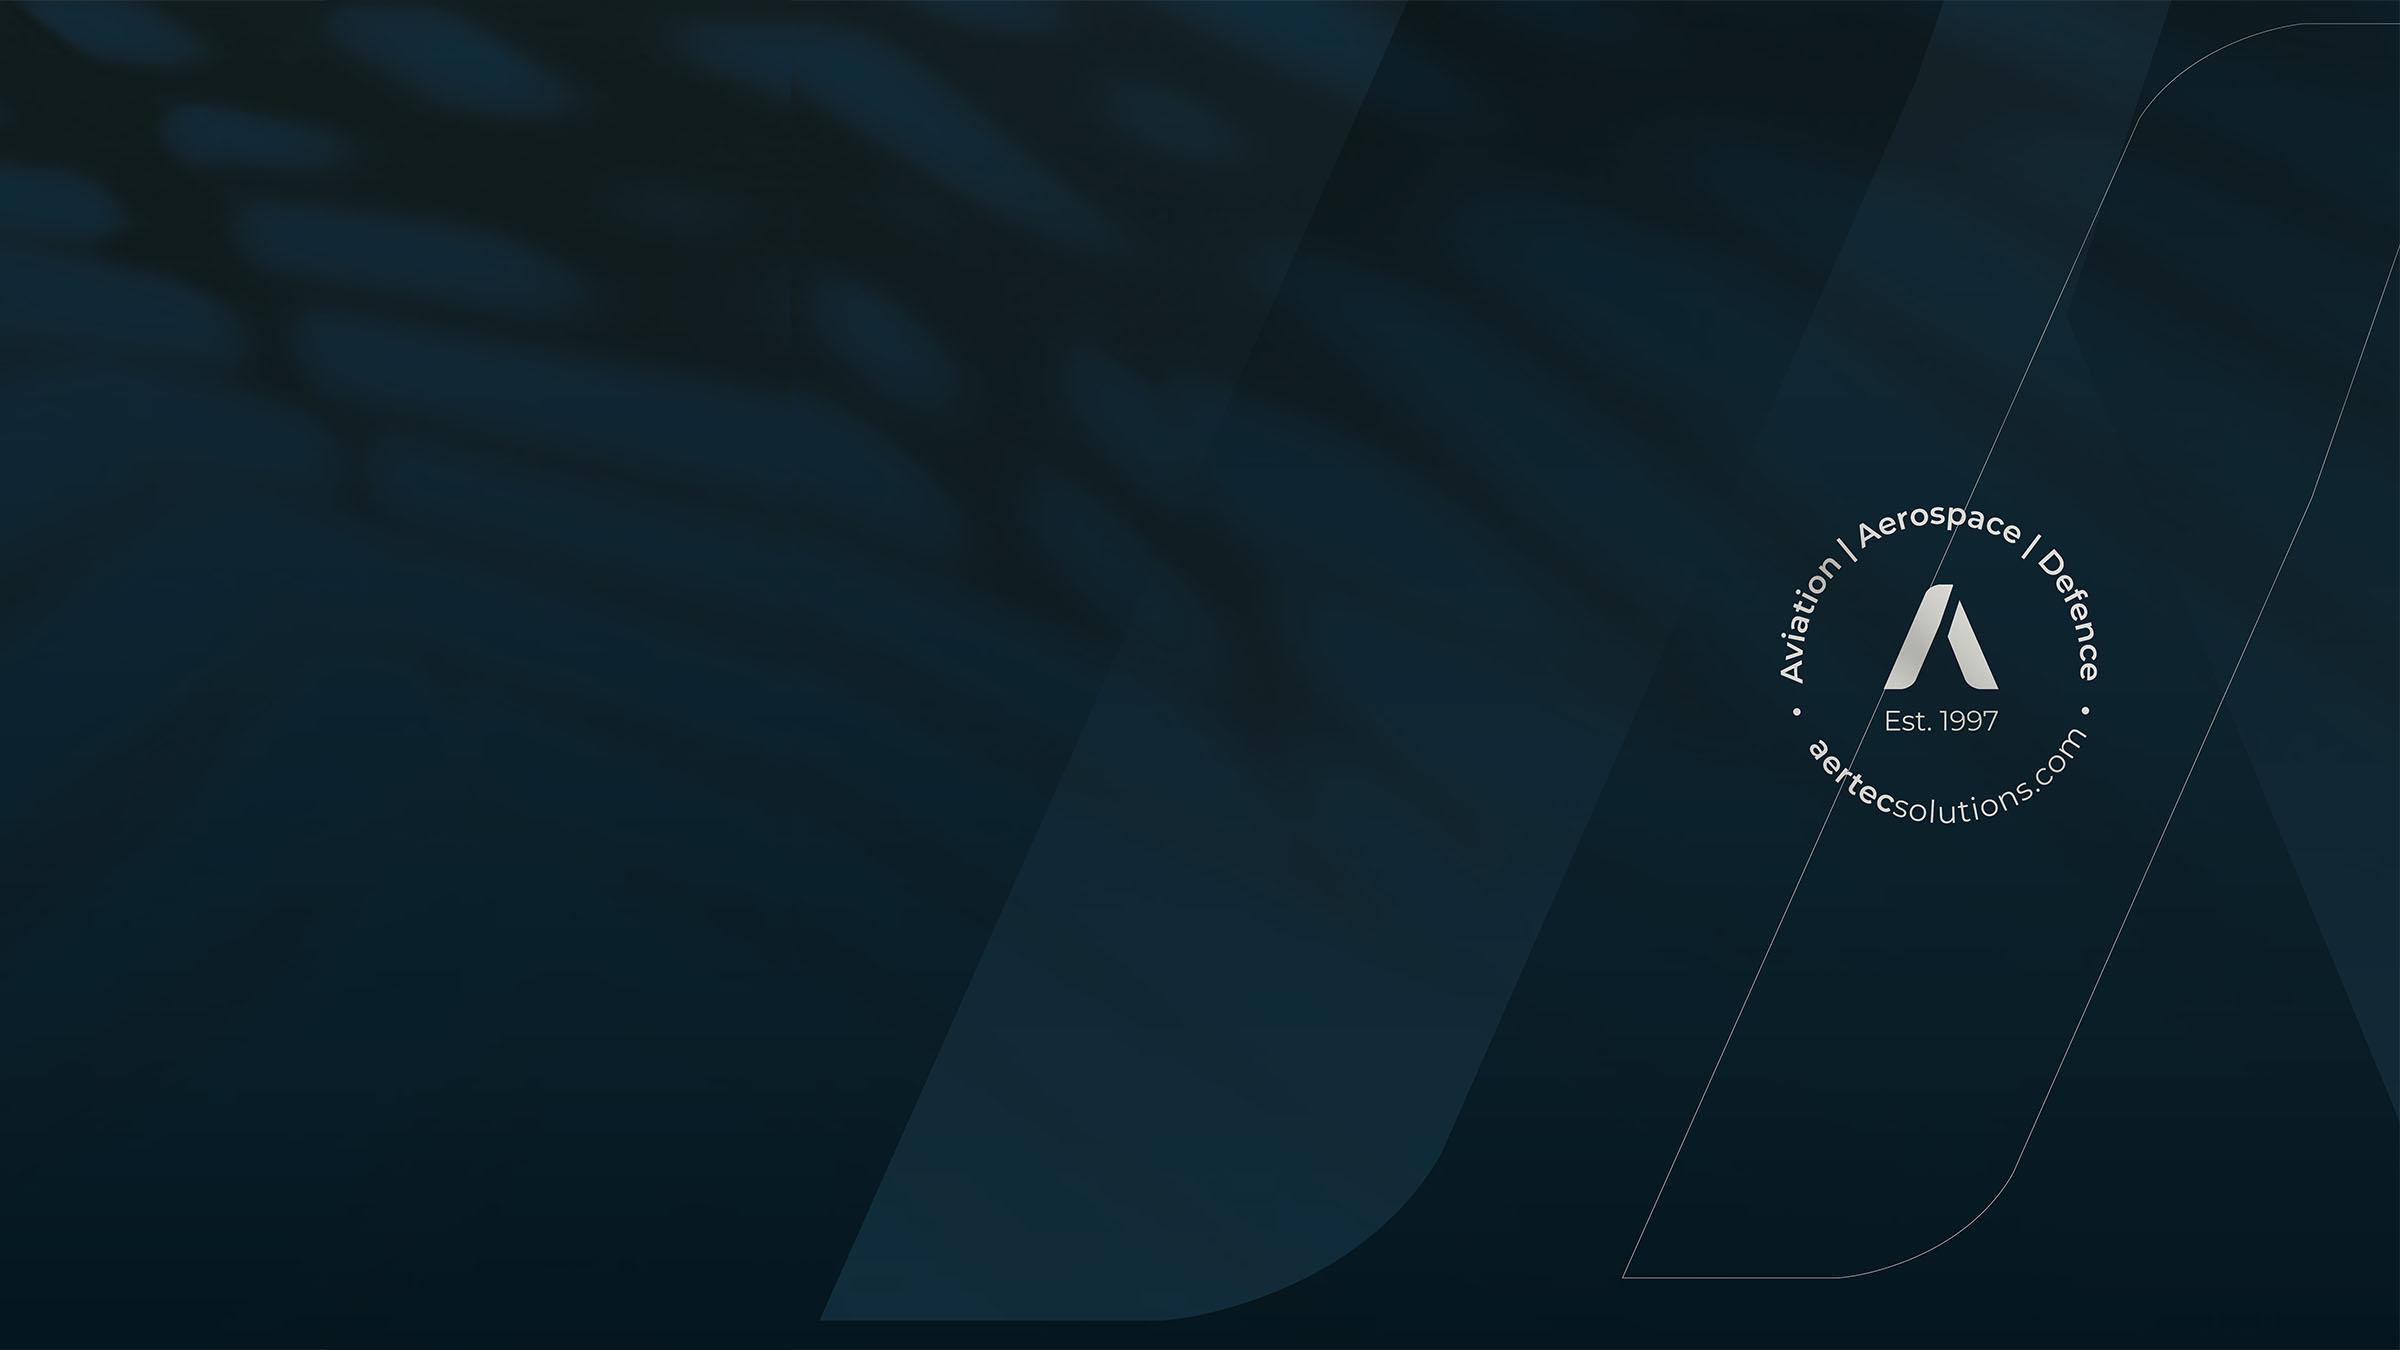 AERTEC brand image